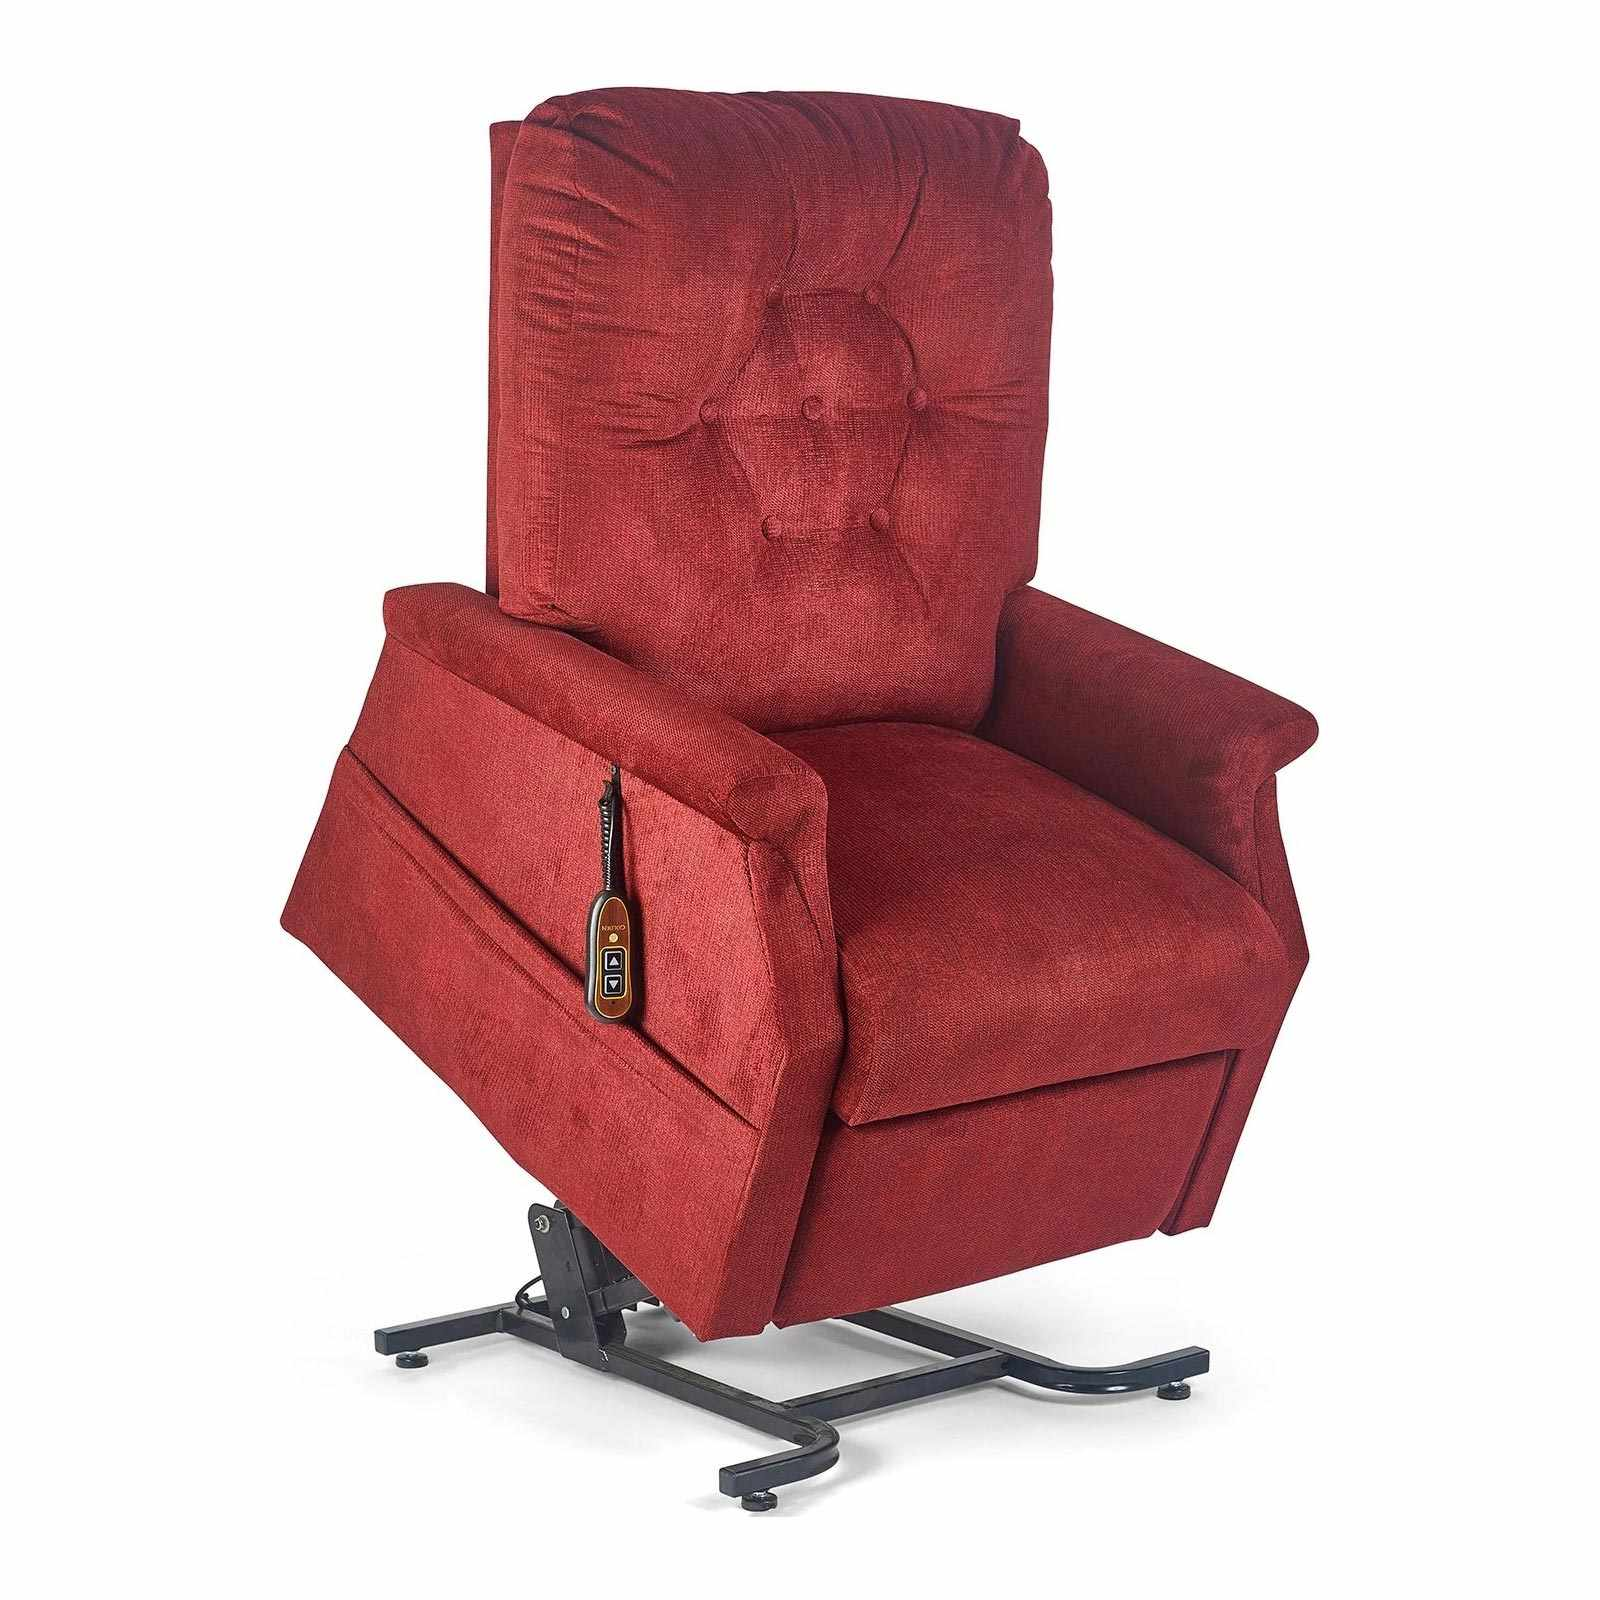 Golden Technologies Capri PR200 Lift Recliner Chair   Medicaleshop